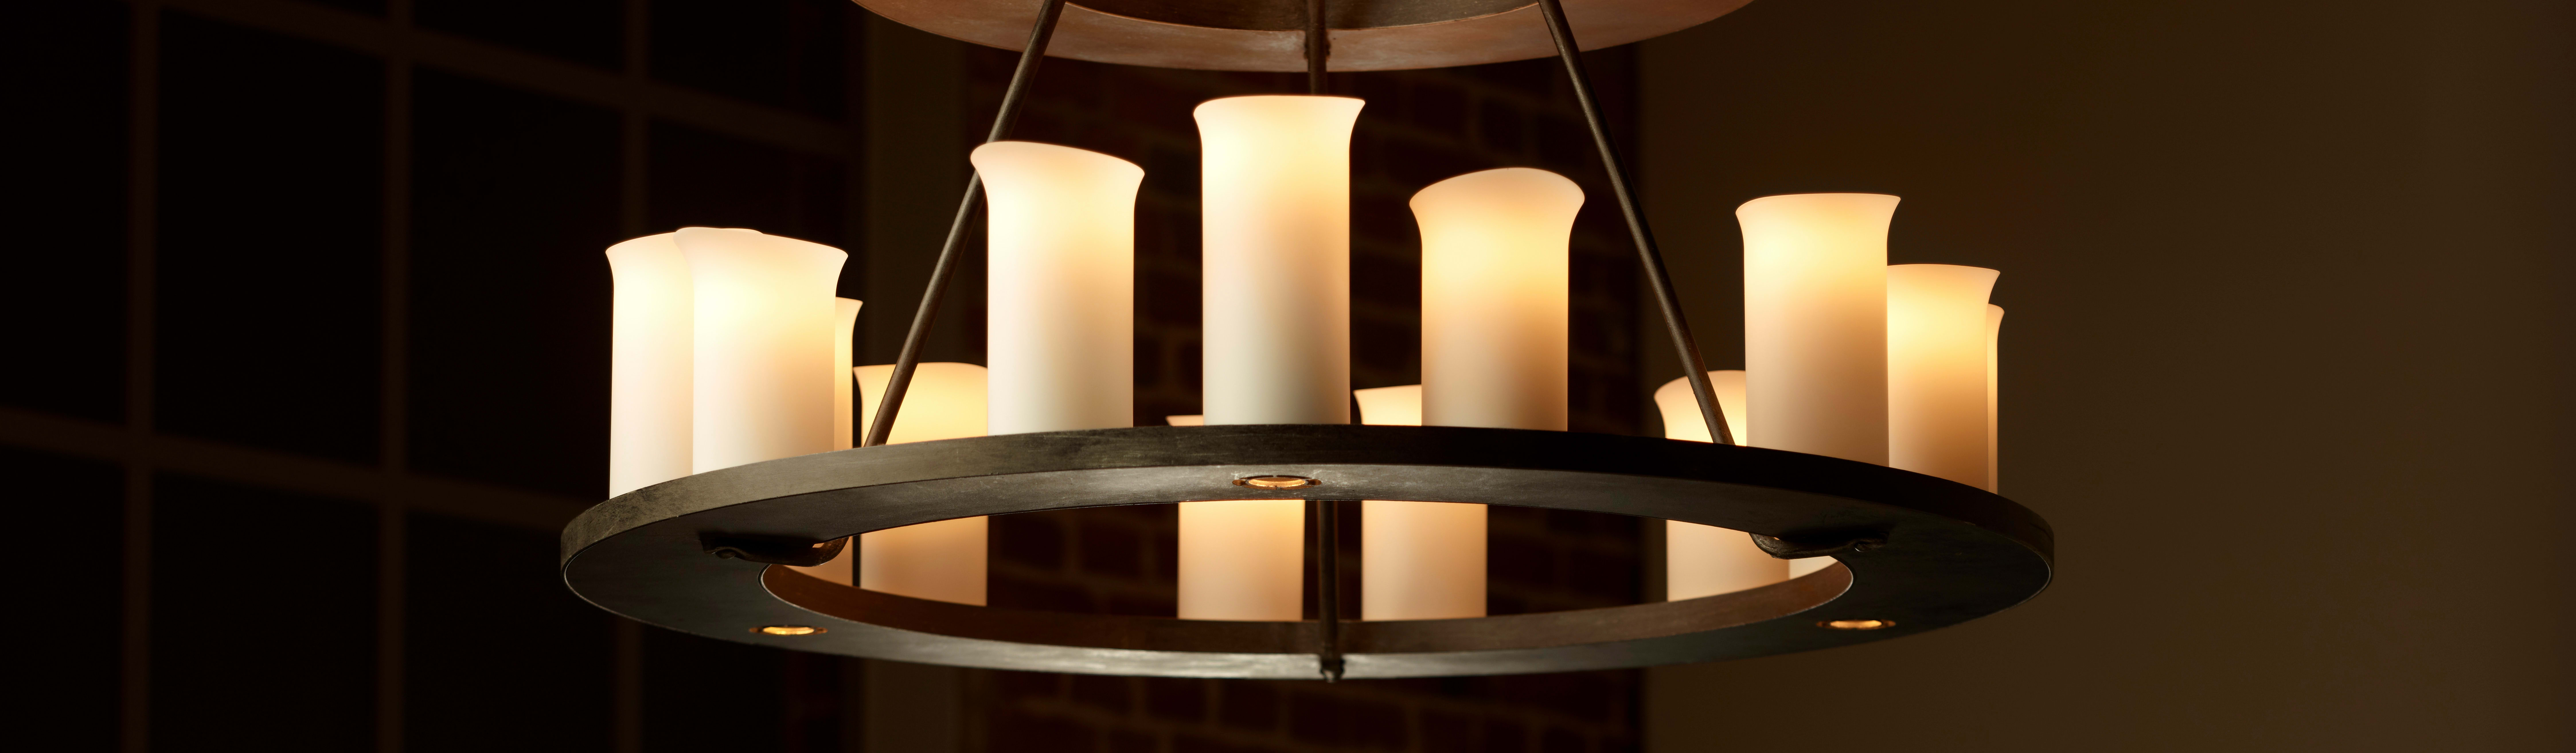 robers leuchten gmbh co kg lighting in s dlohn homify. Black Bedroom Furniture Sets. Home Design Ideas